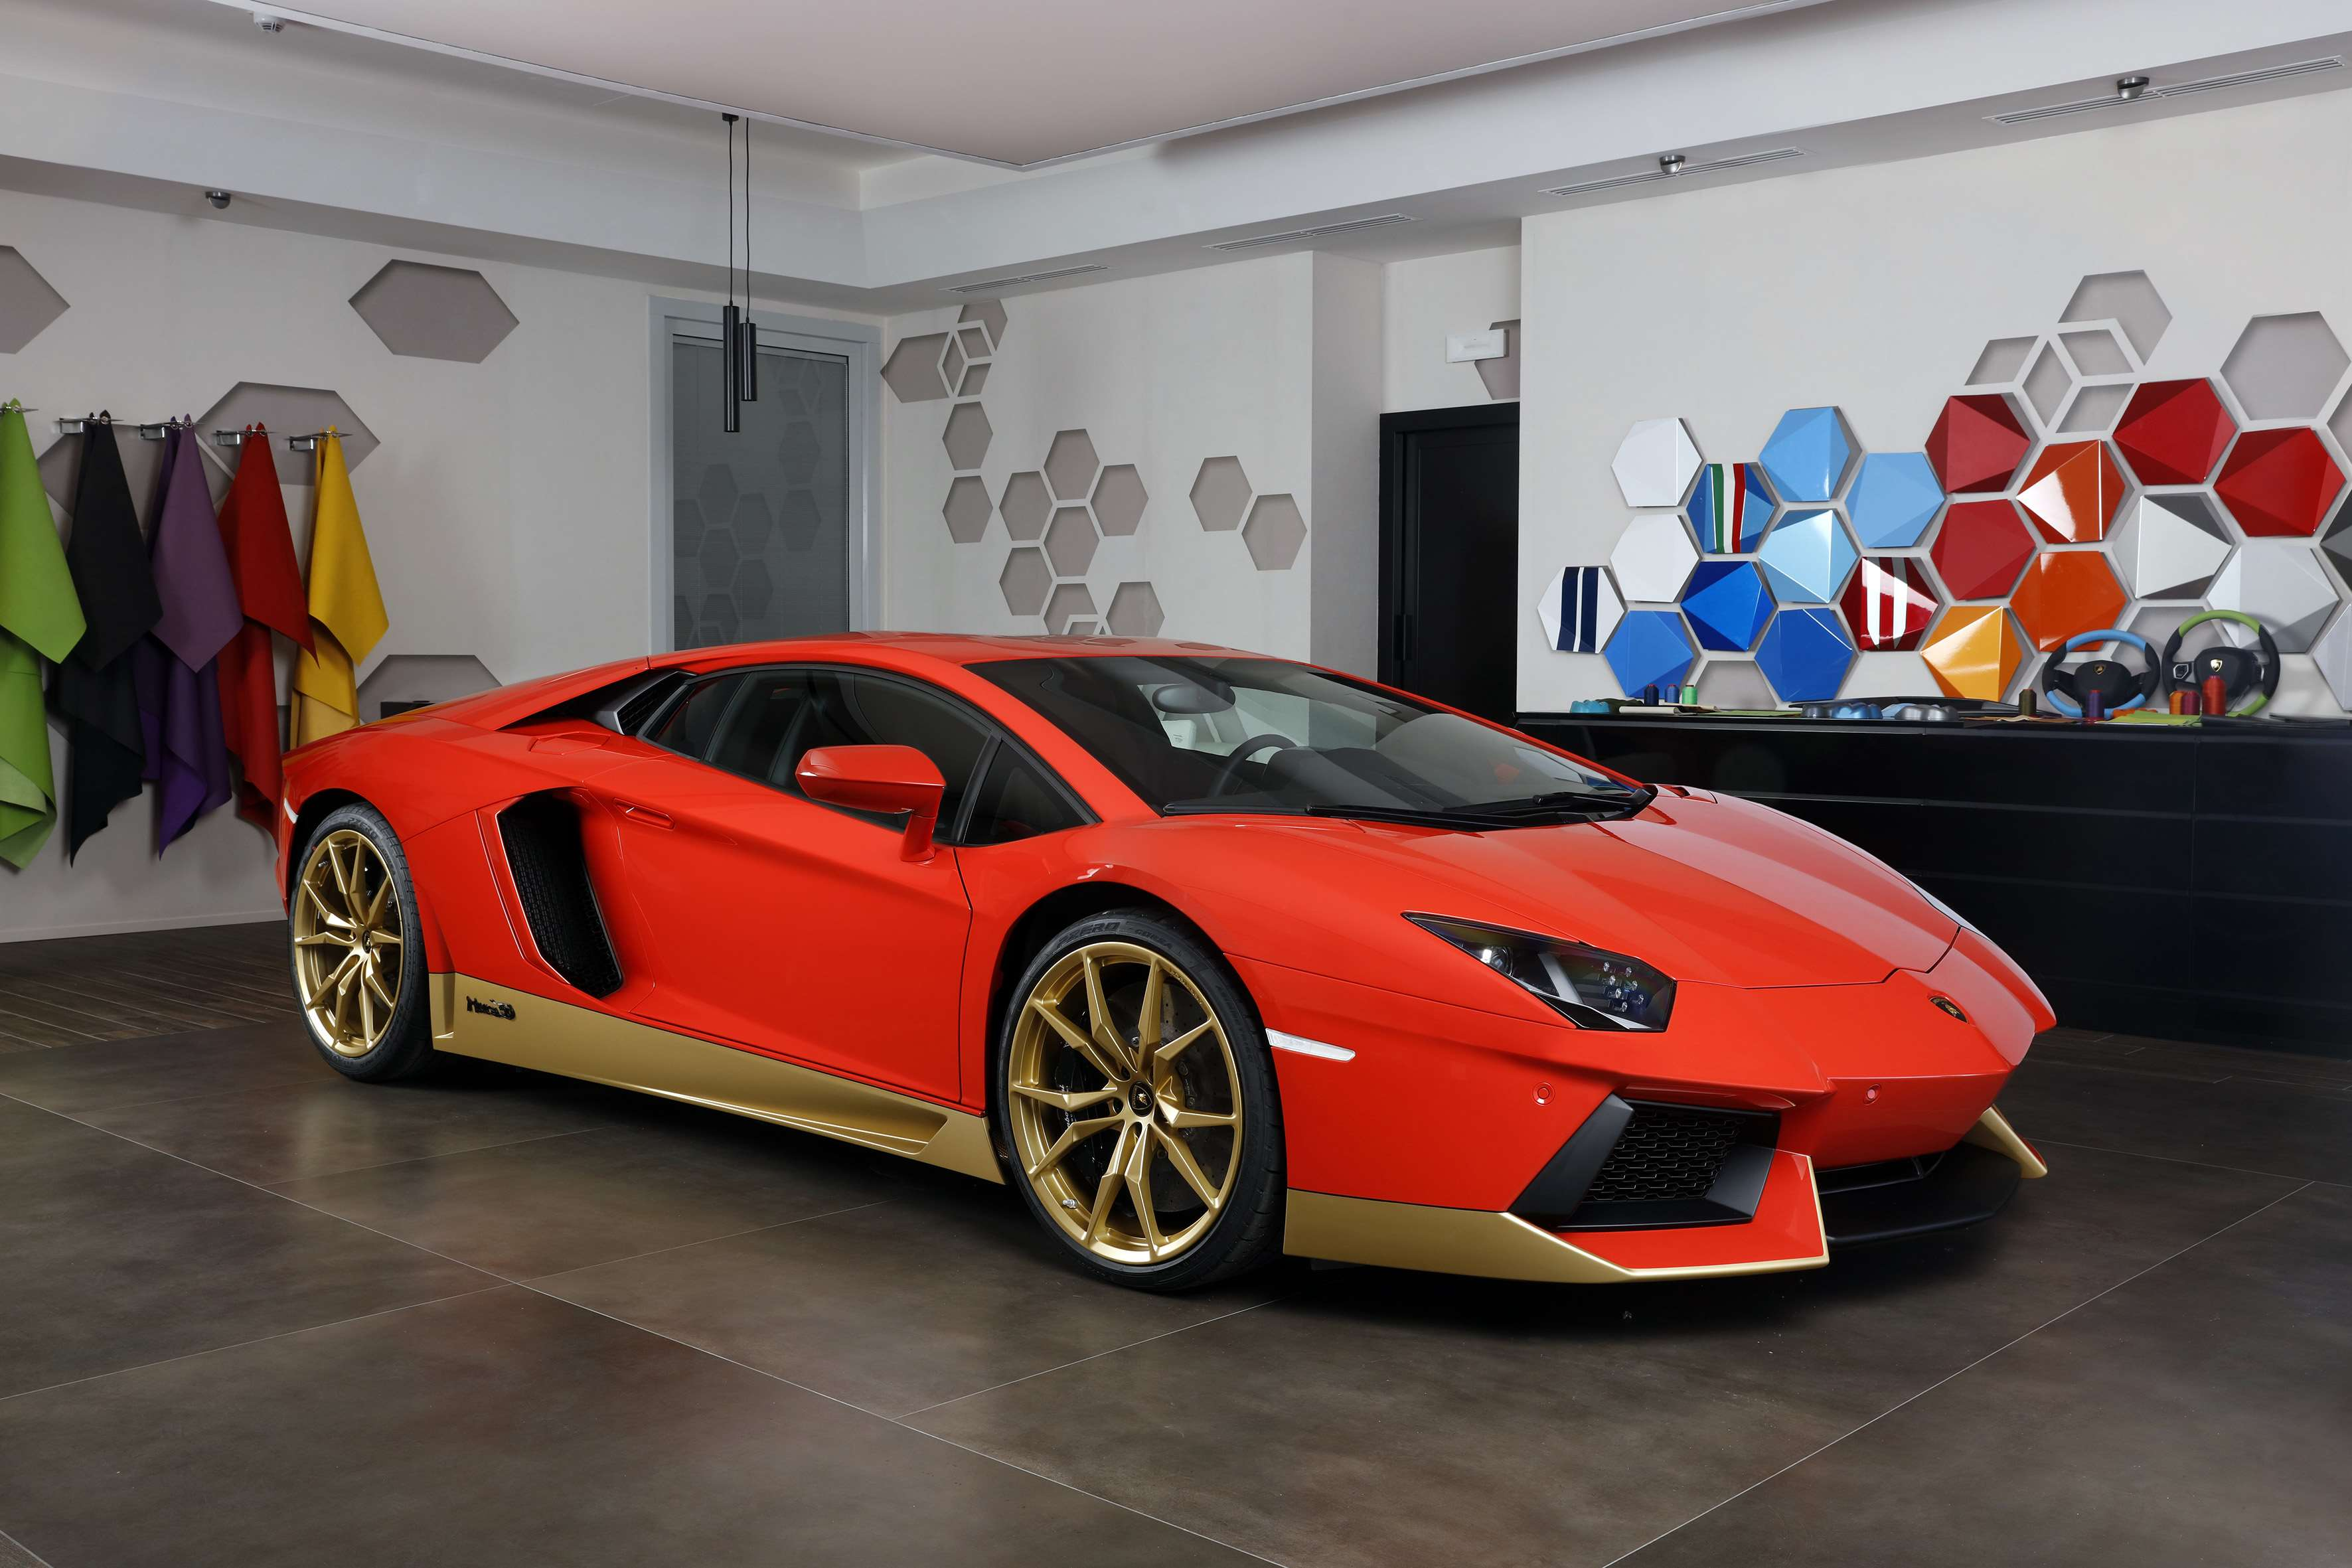 Lamborghini News | St. Louis, Missouri 63005 | St. Louis Motorcars on